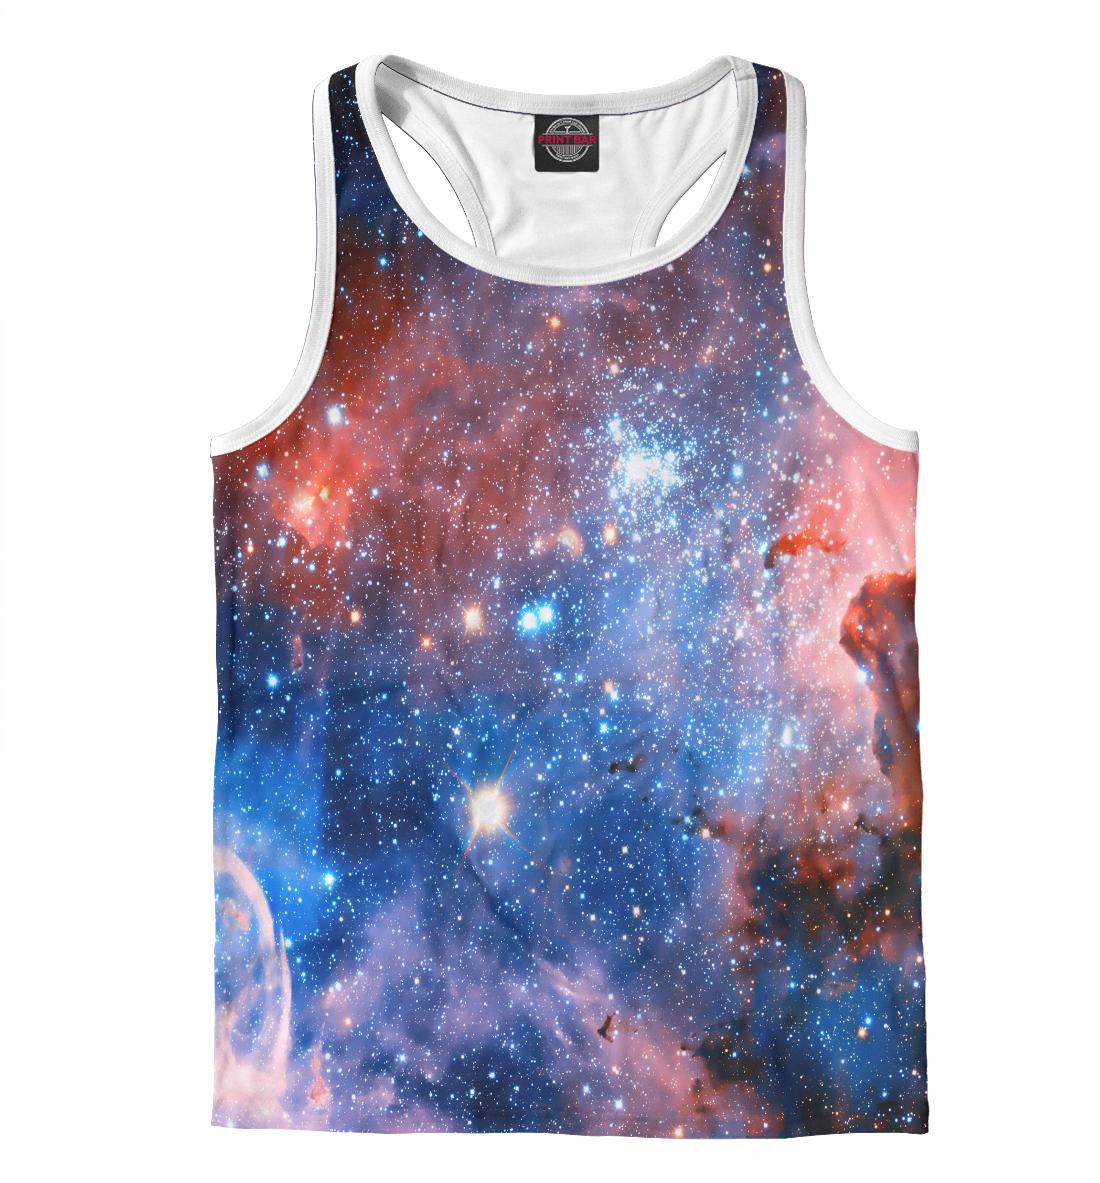 Купить Вселенная, Printbar, Майки борцовки, SPA-628619-mayb-2